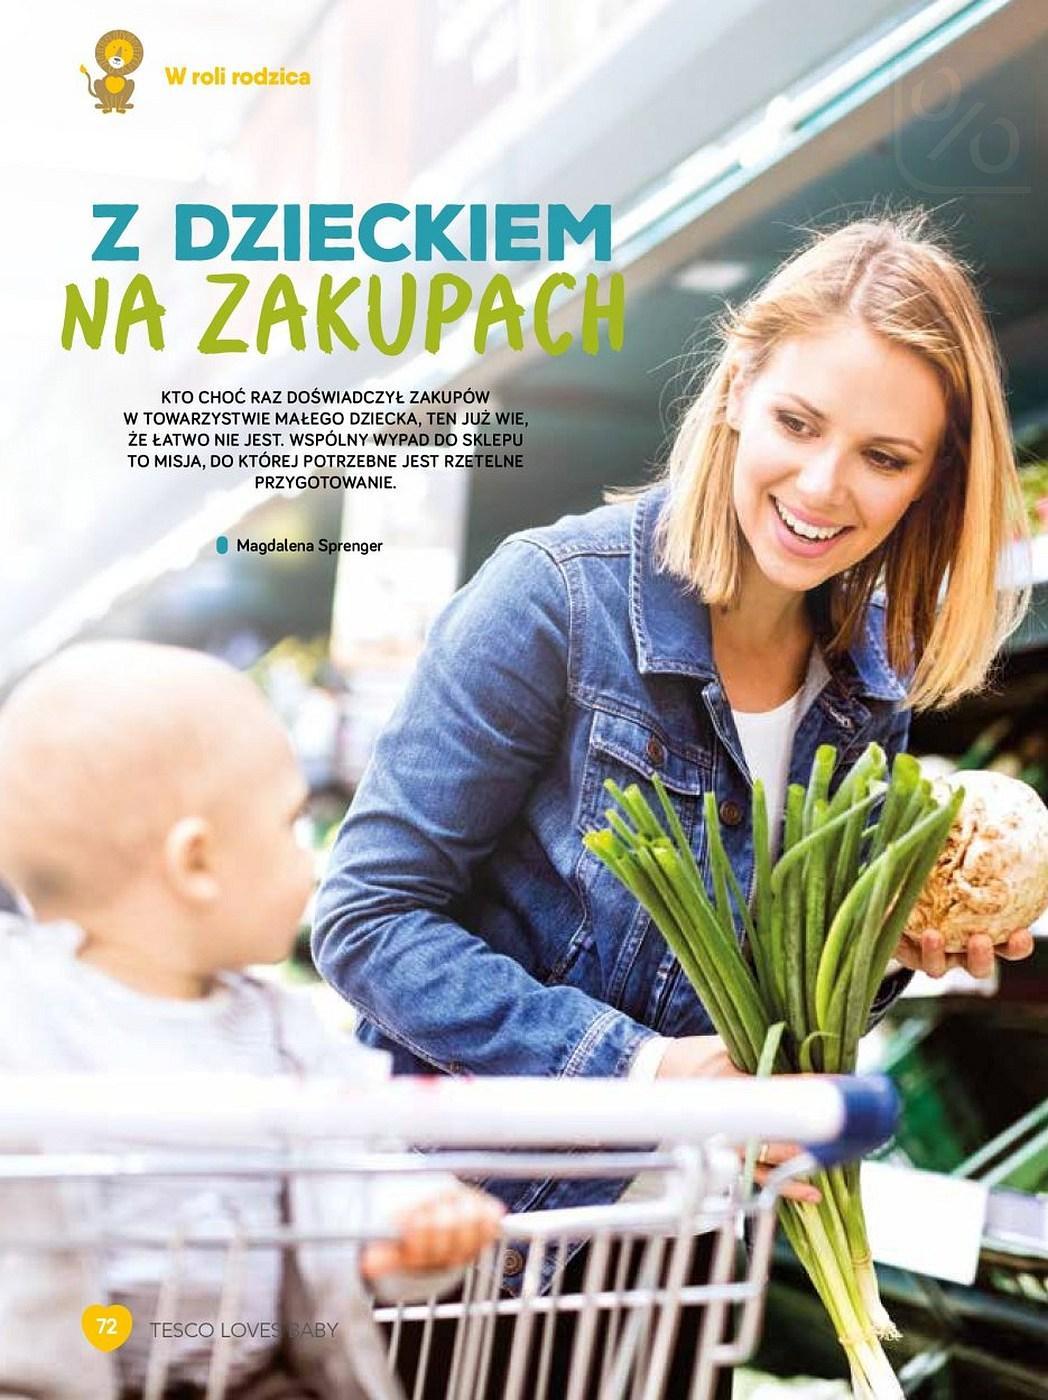 Gazetka promocyjna Tesco do 31/10/2018 str.72